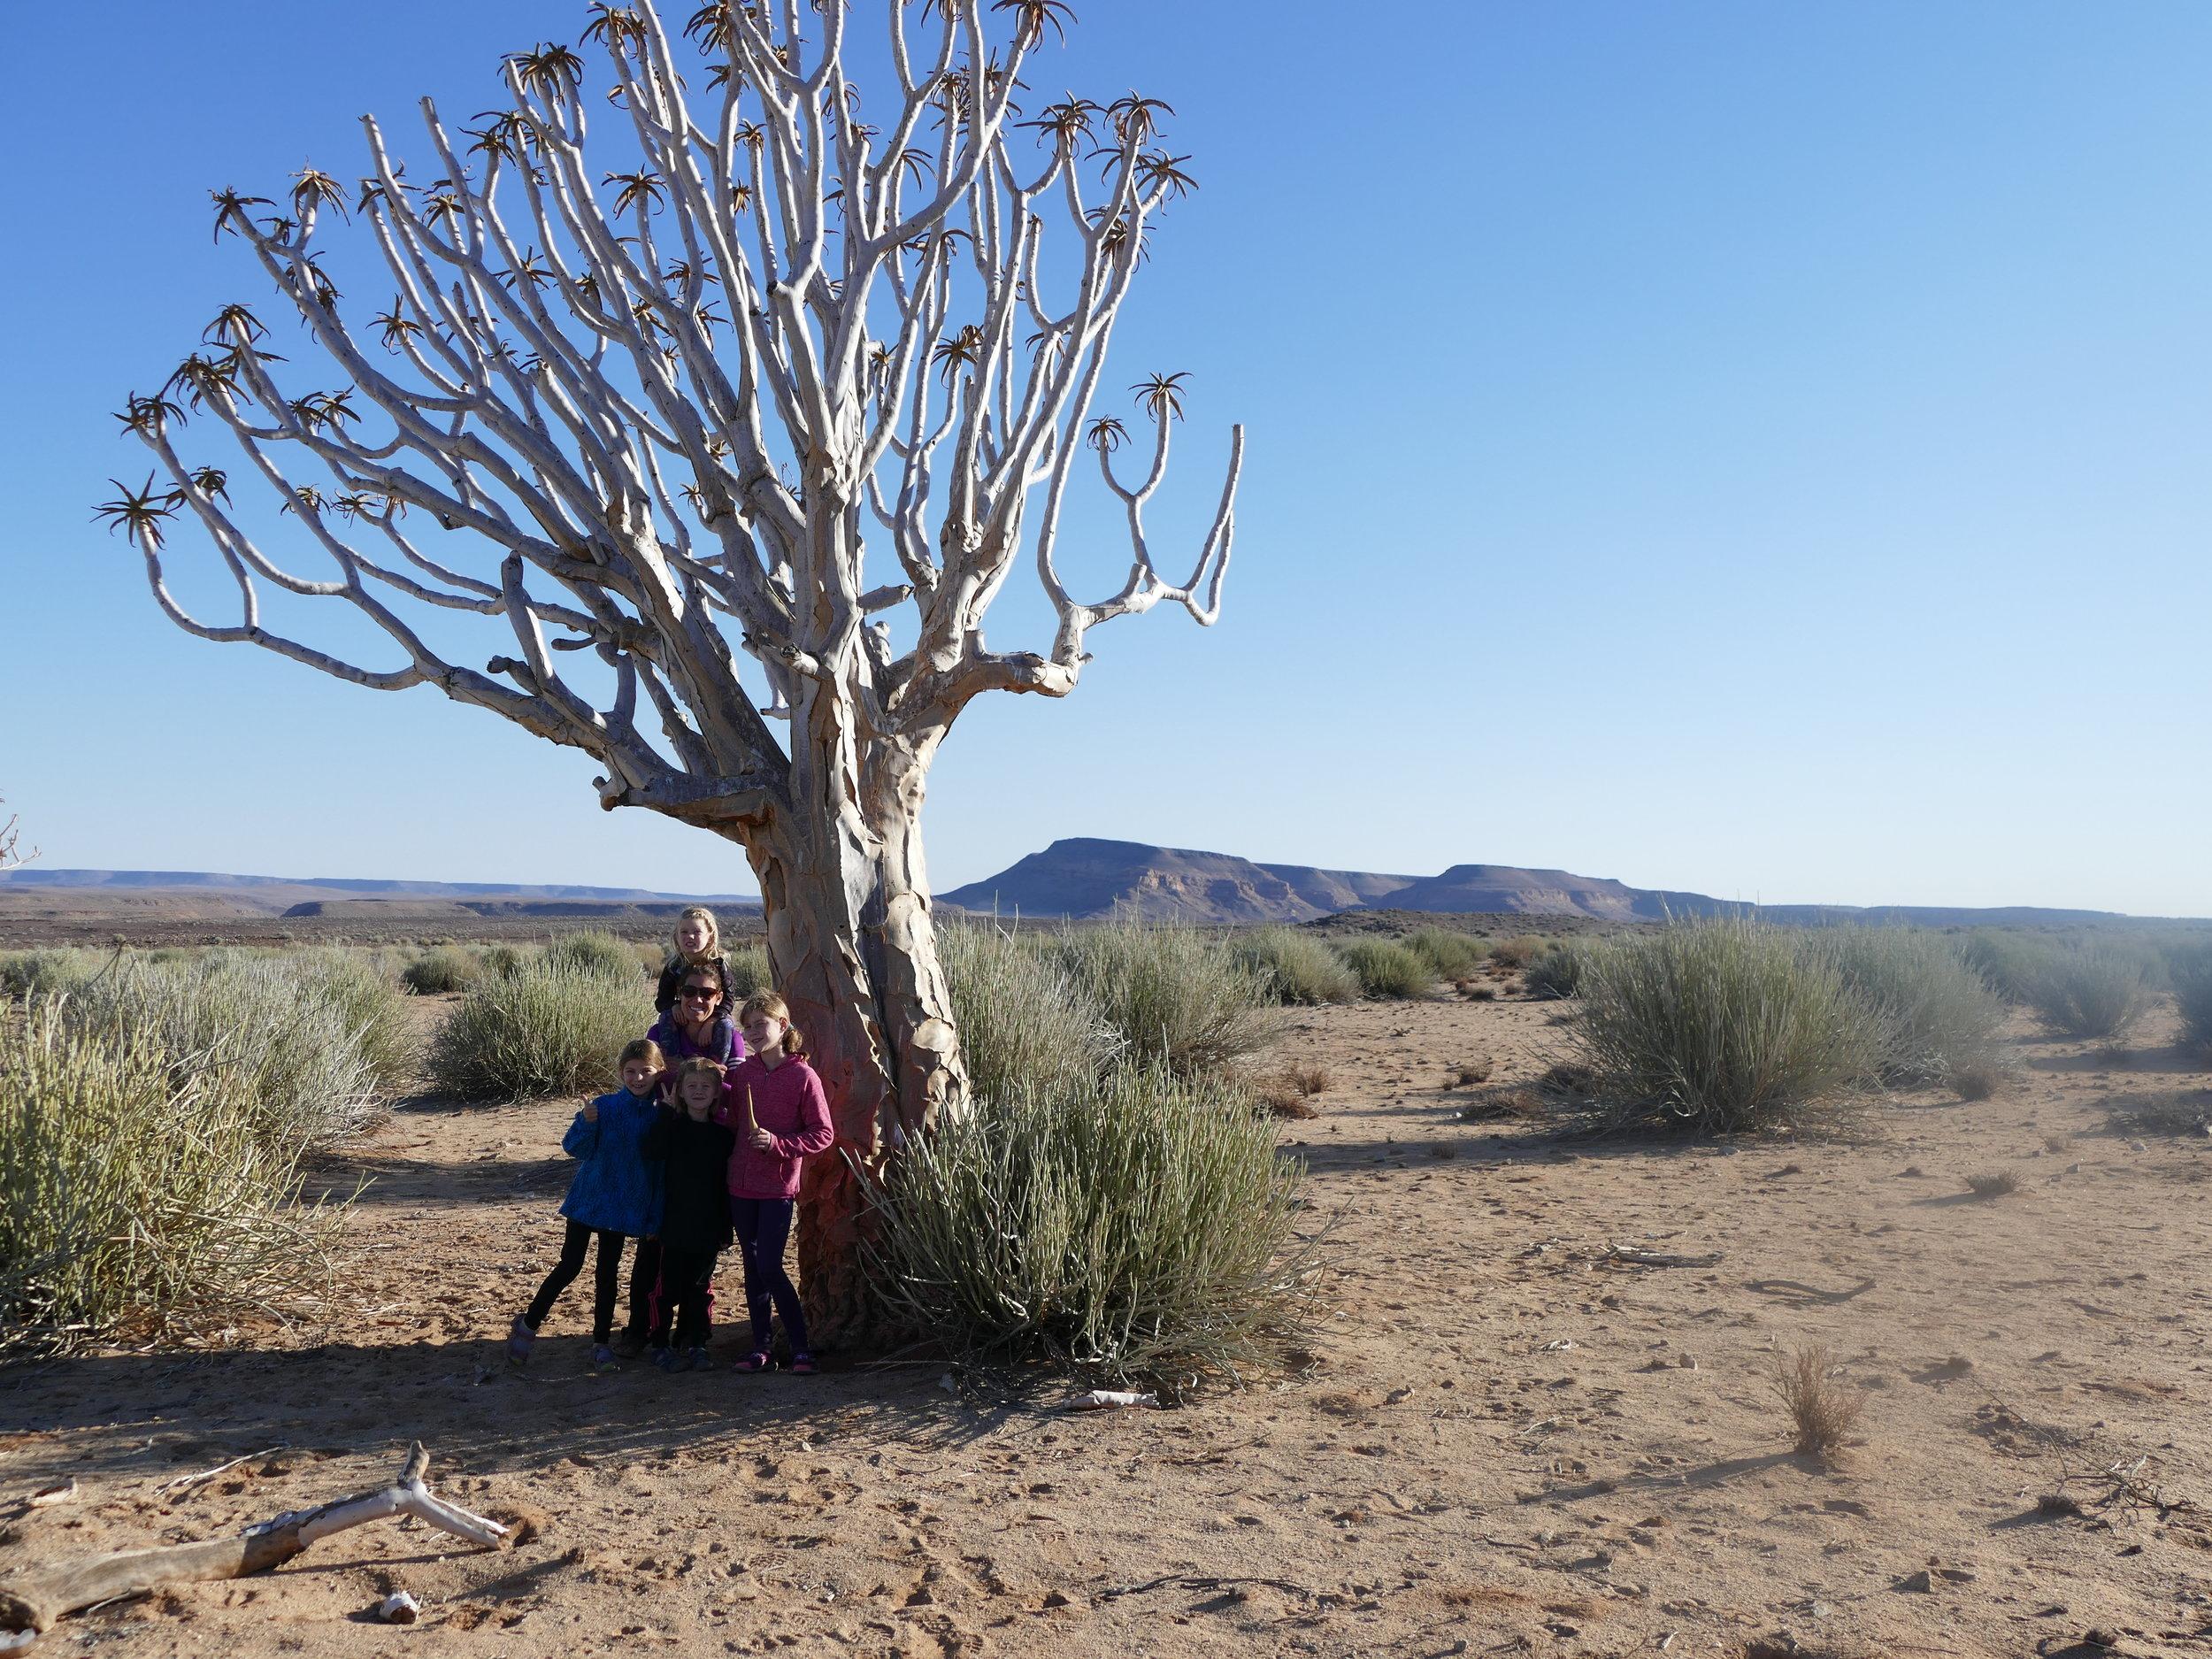 Magnifique Namibie, on se reverra..